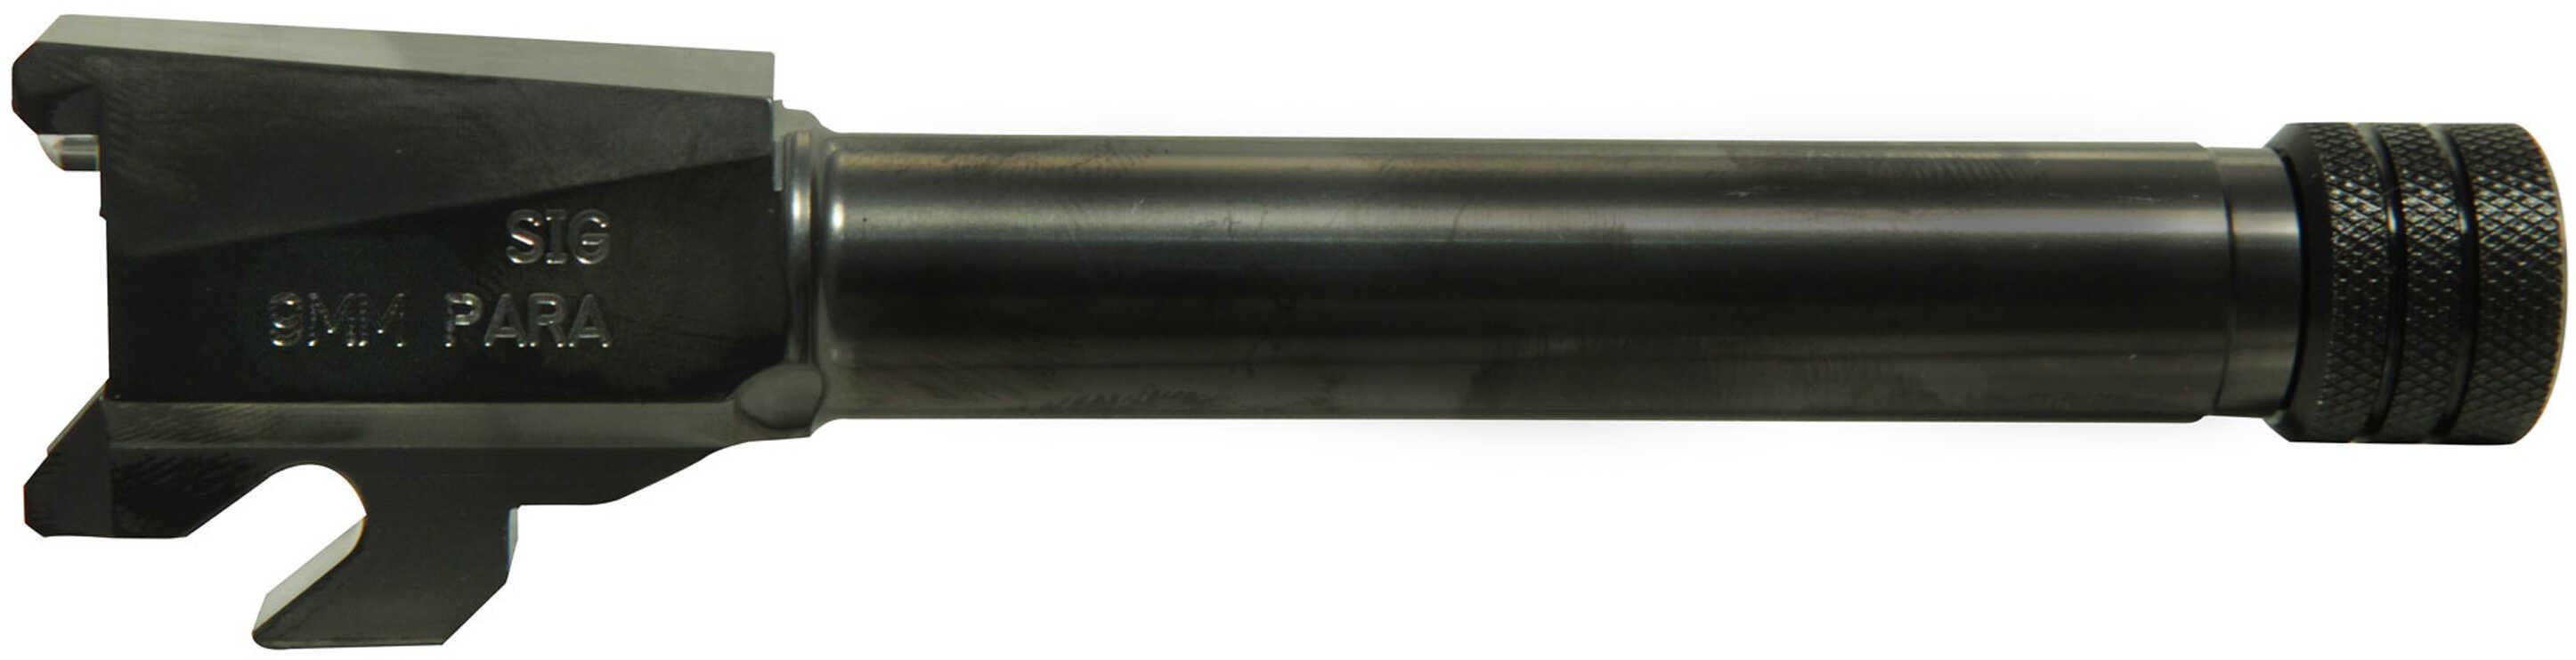 SigTac P250 Compact, 9mm Luger, M13.5x1 Left Hand Threaded Barrel, Black Md: BBL-MOD-C-9-TB